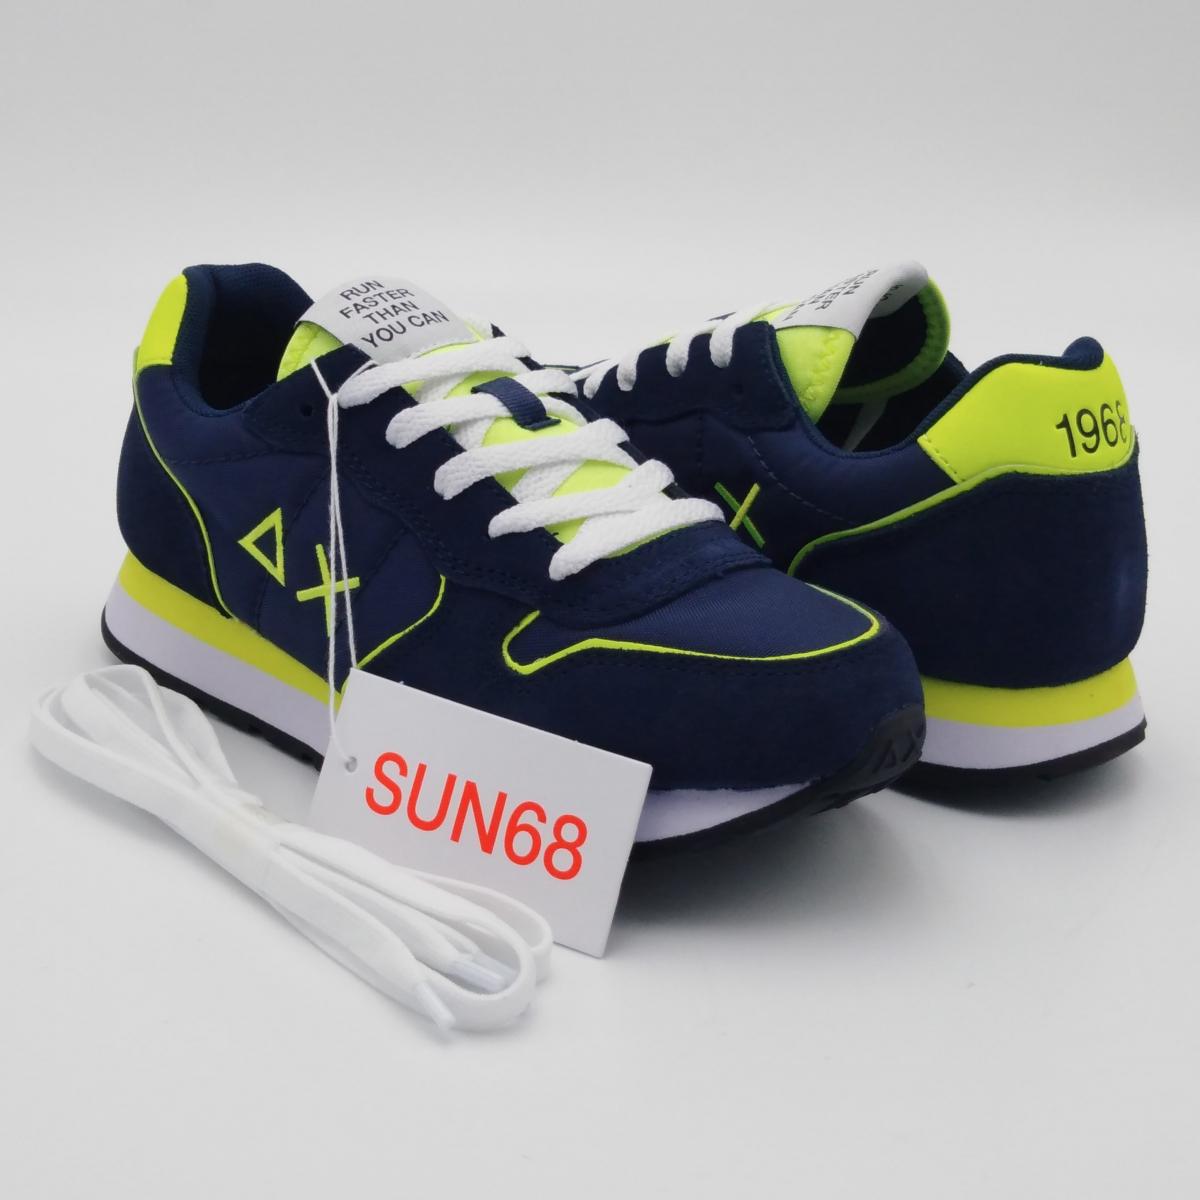 Sun 68 -Sneaker ragazzo Tom...